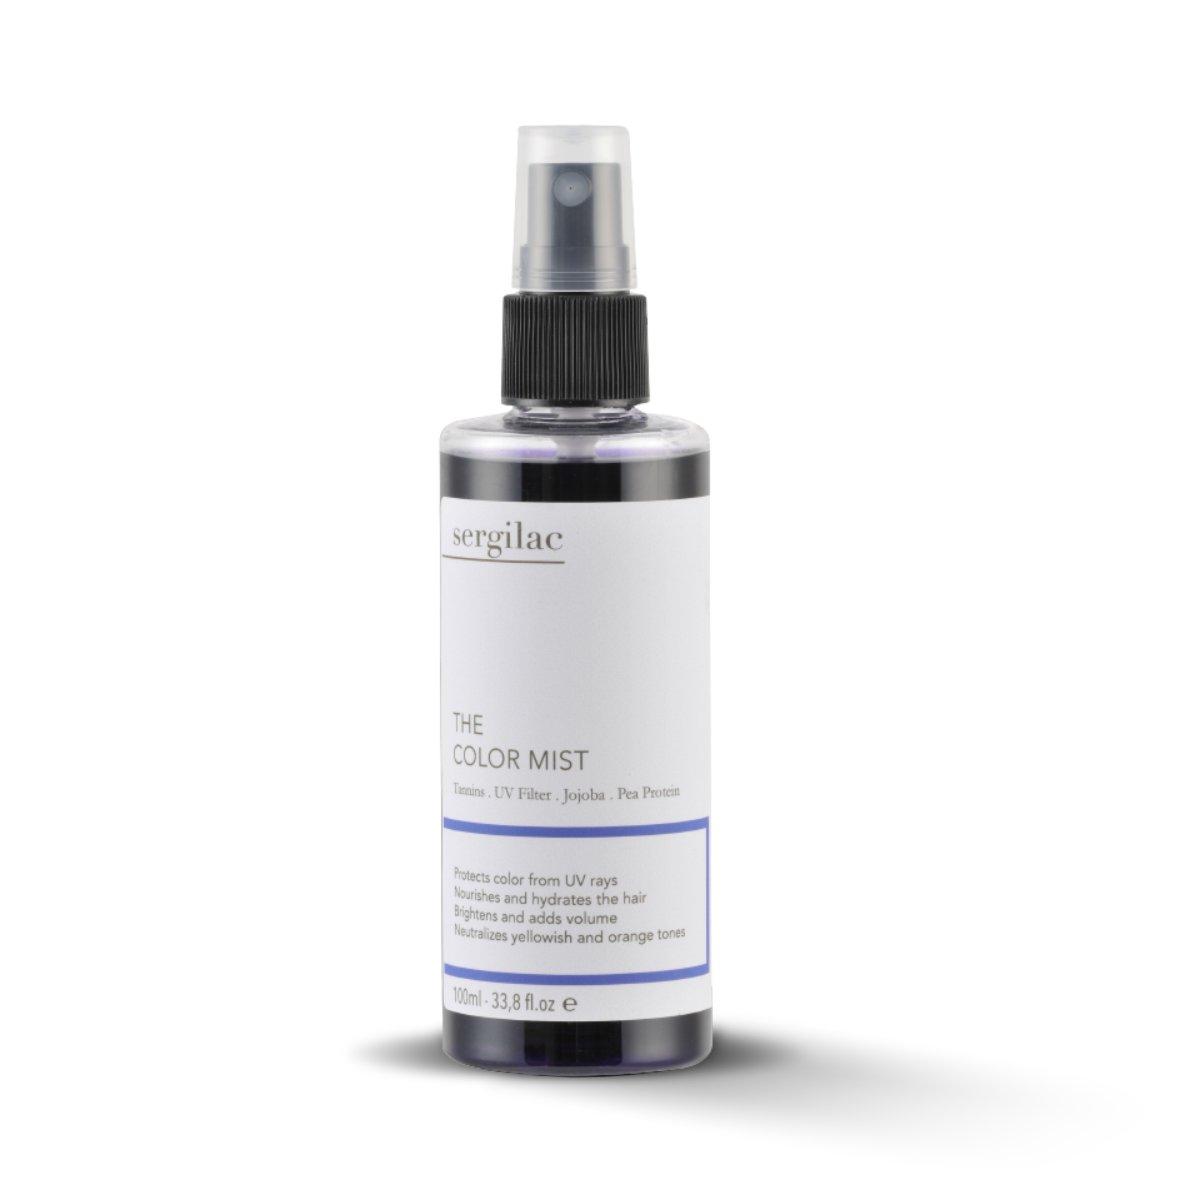 The Color Mist Serum - Sergilac 100ml